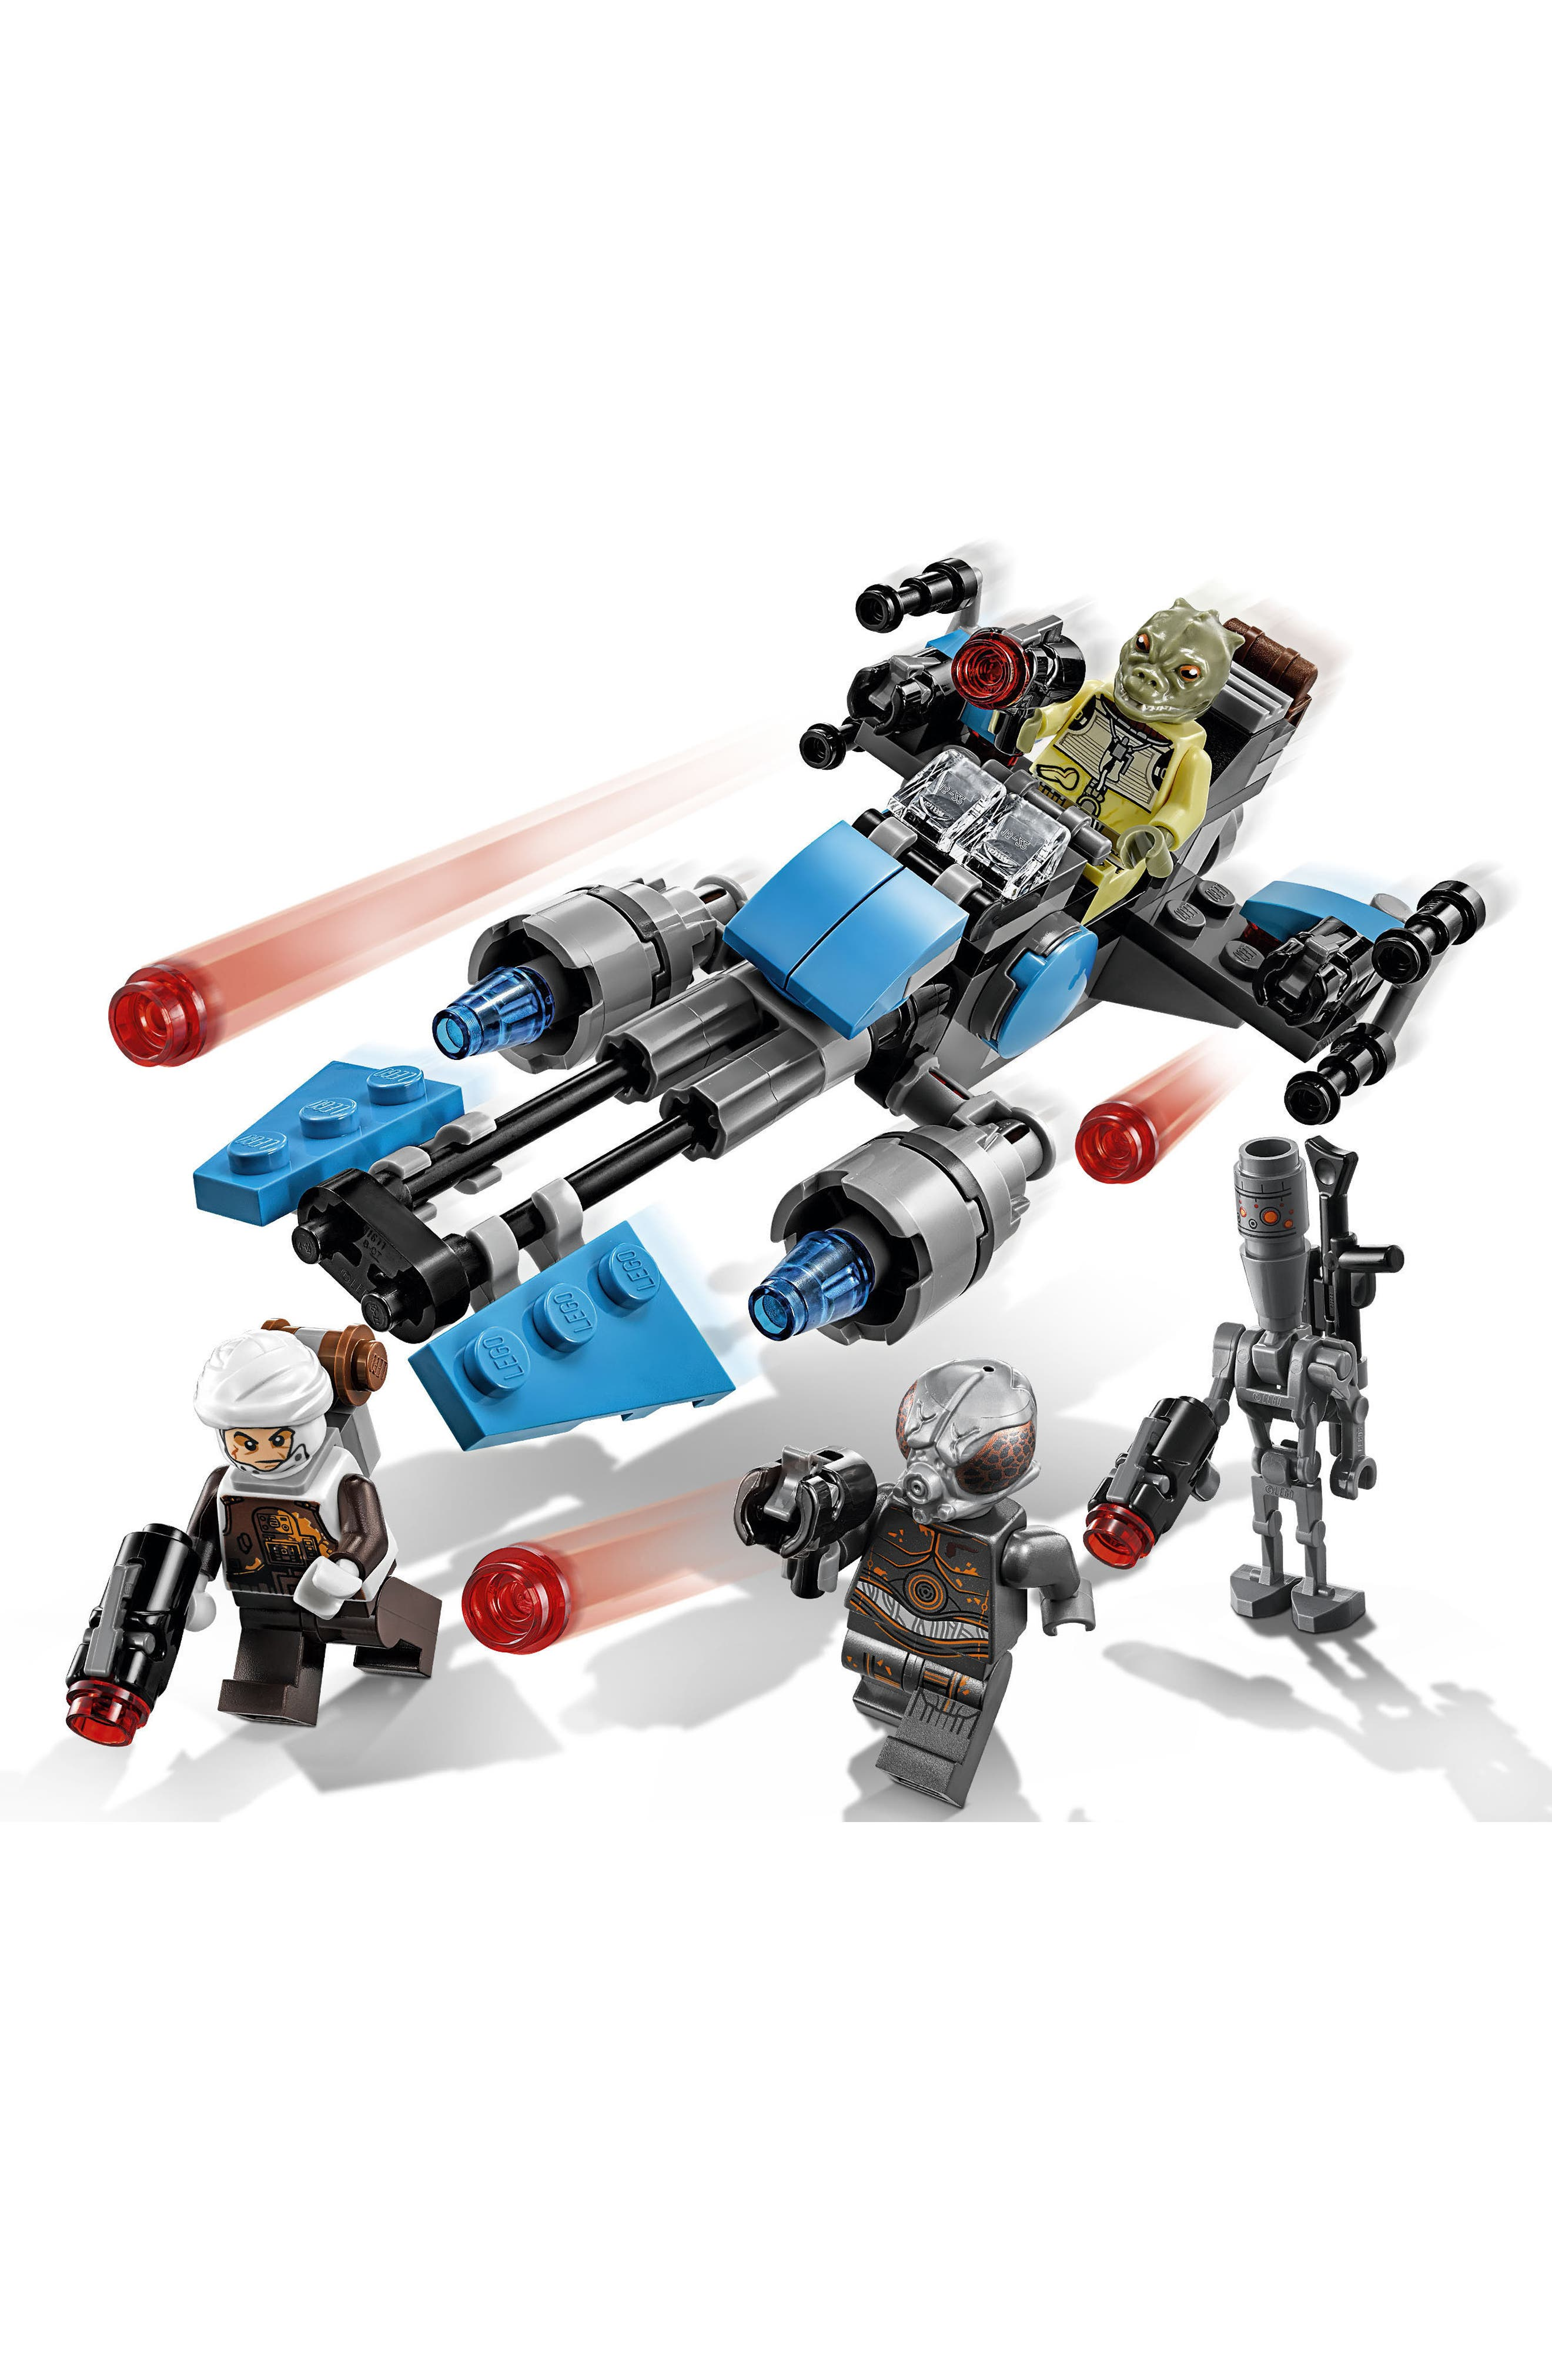 Star Wars<sup>™</sup> Bounty Hunter Speeder Bike<sup>™</sup> Battle Pack - 75167,                             Alternate thumbnail 4, color,